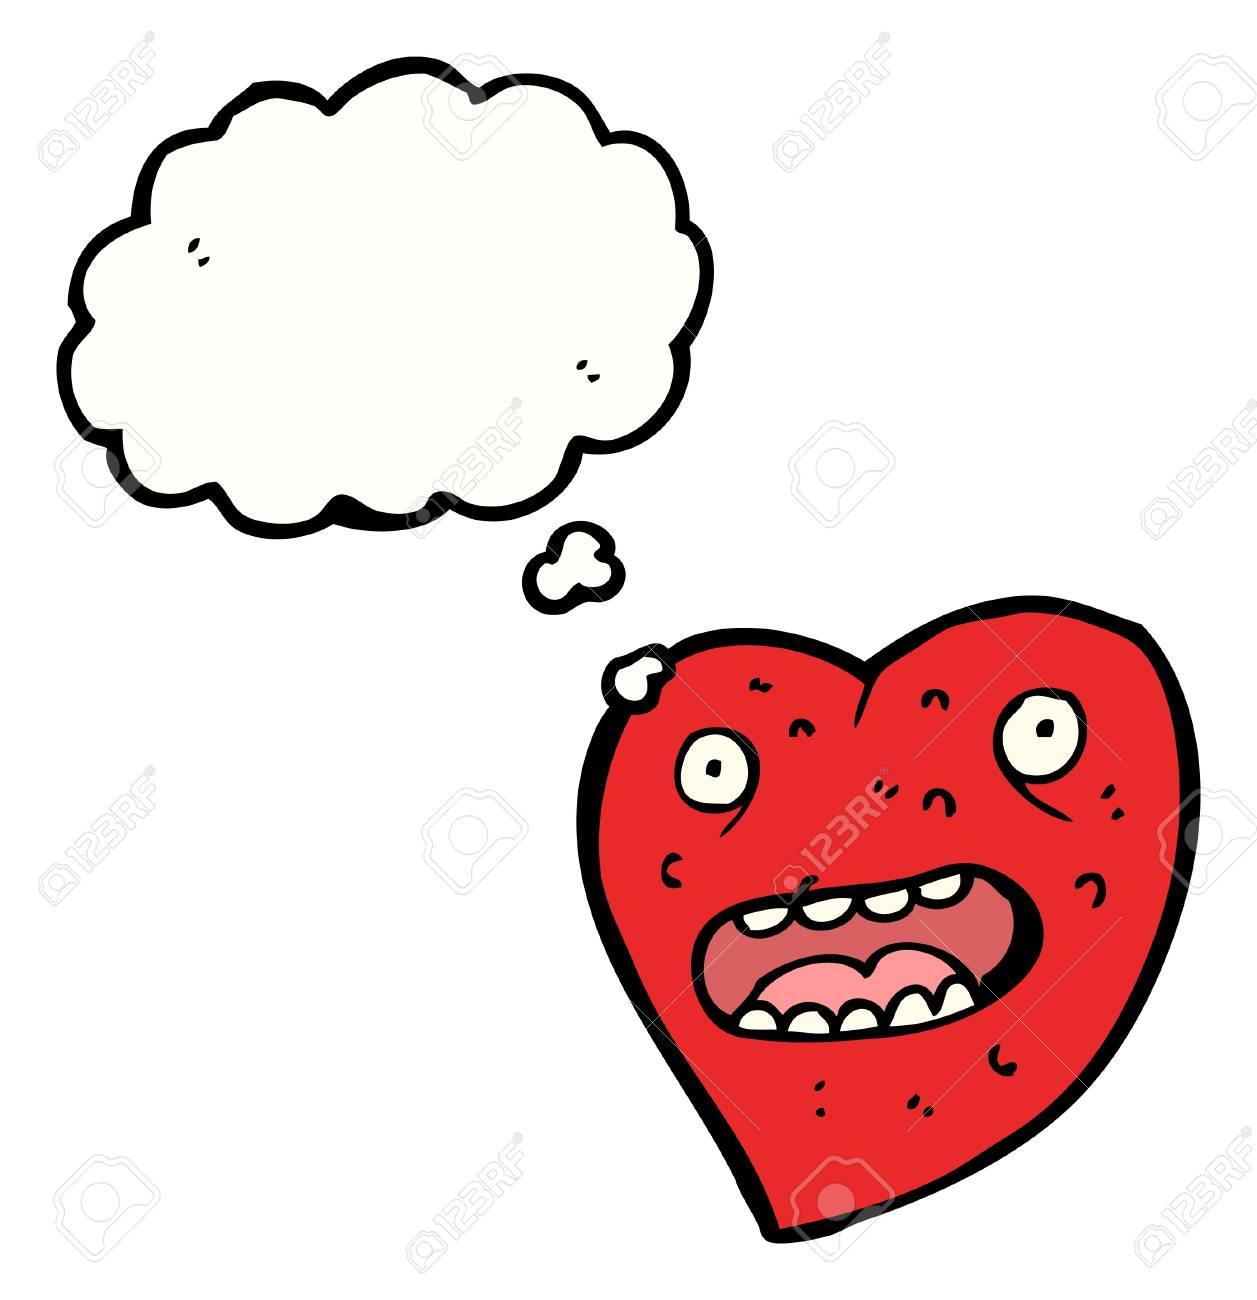 cartoon heart with speech bubble Stock Vector - 16240673